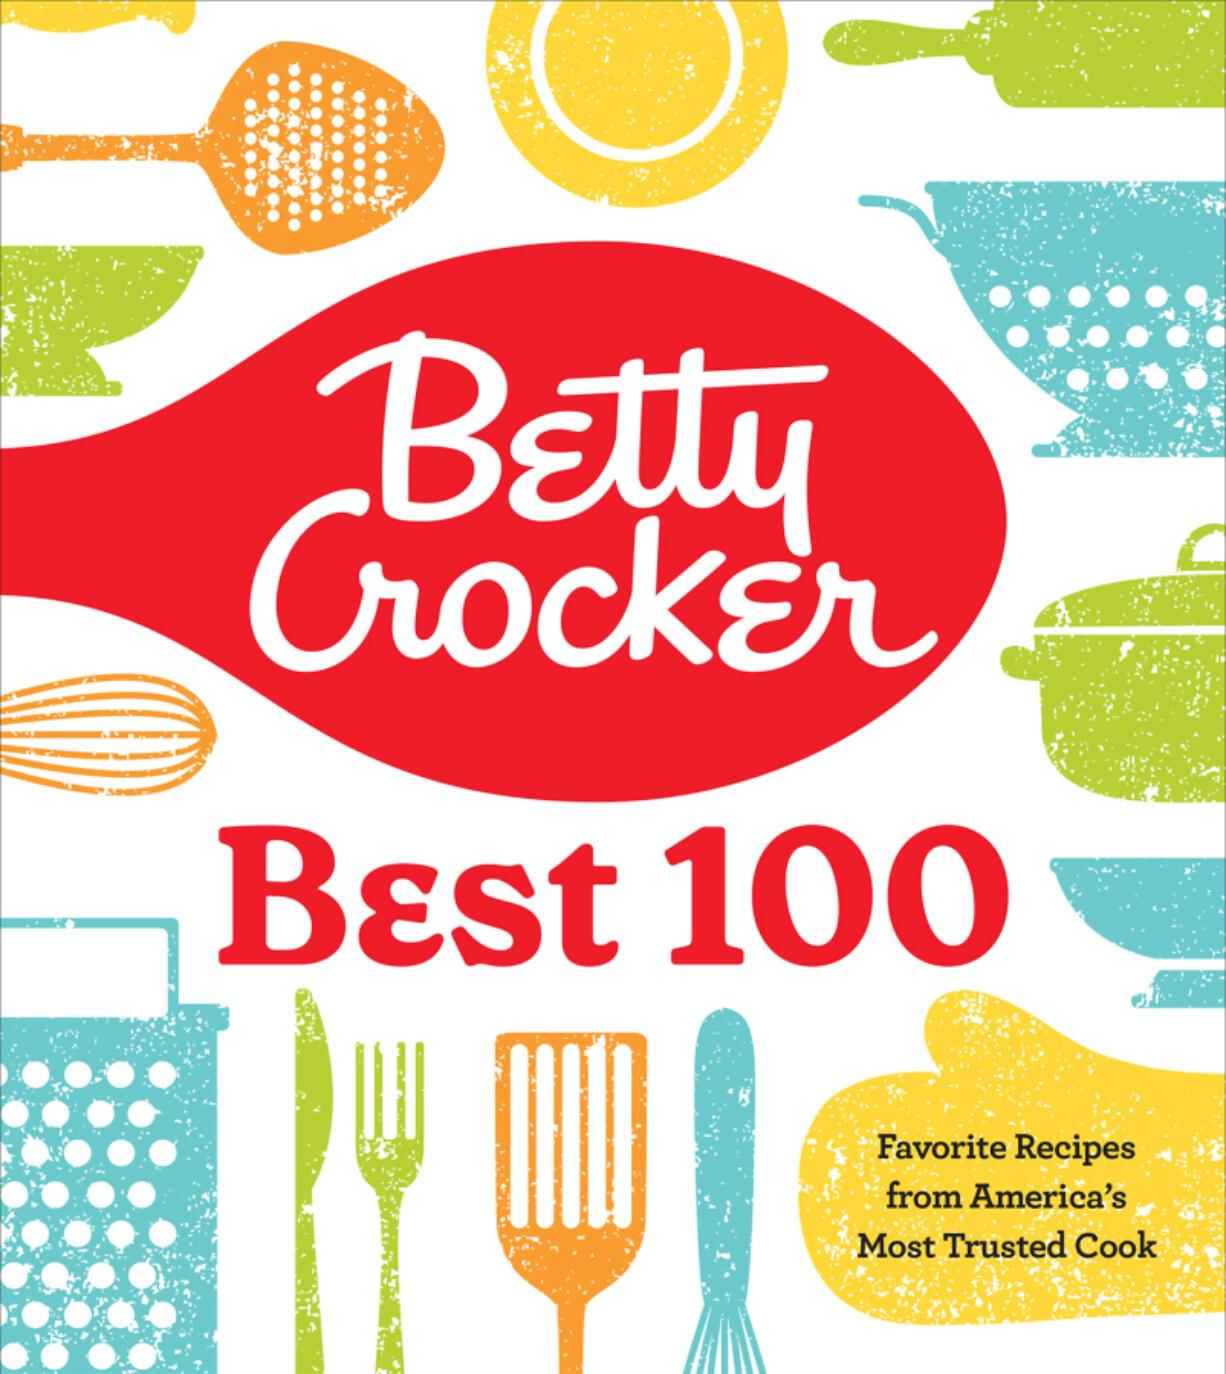 """Betty Crocker Best 100: Favorite Recipes From America's Most Trusted Cook,"" by Betty Crocker."